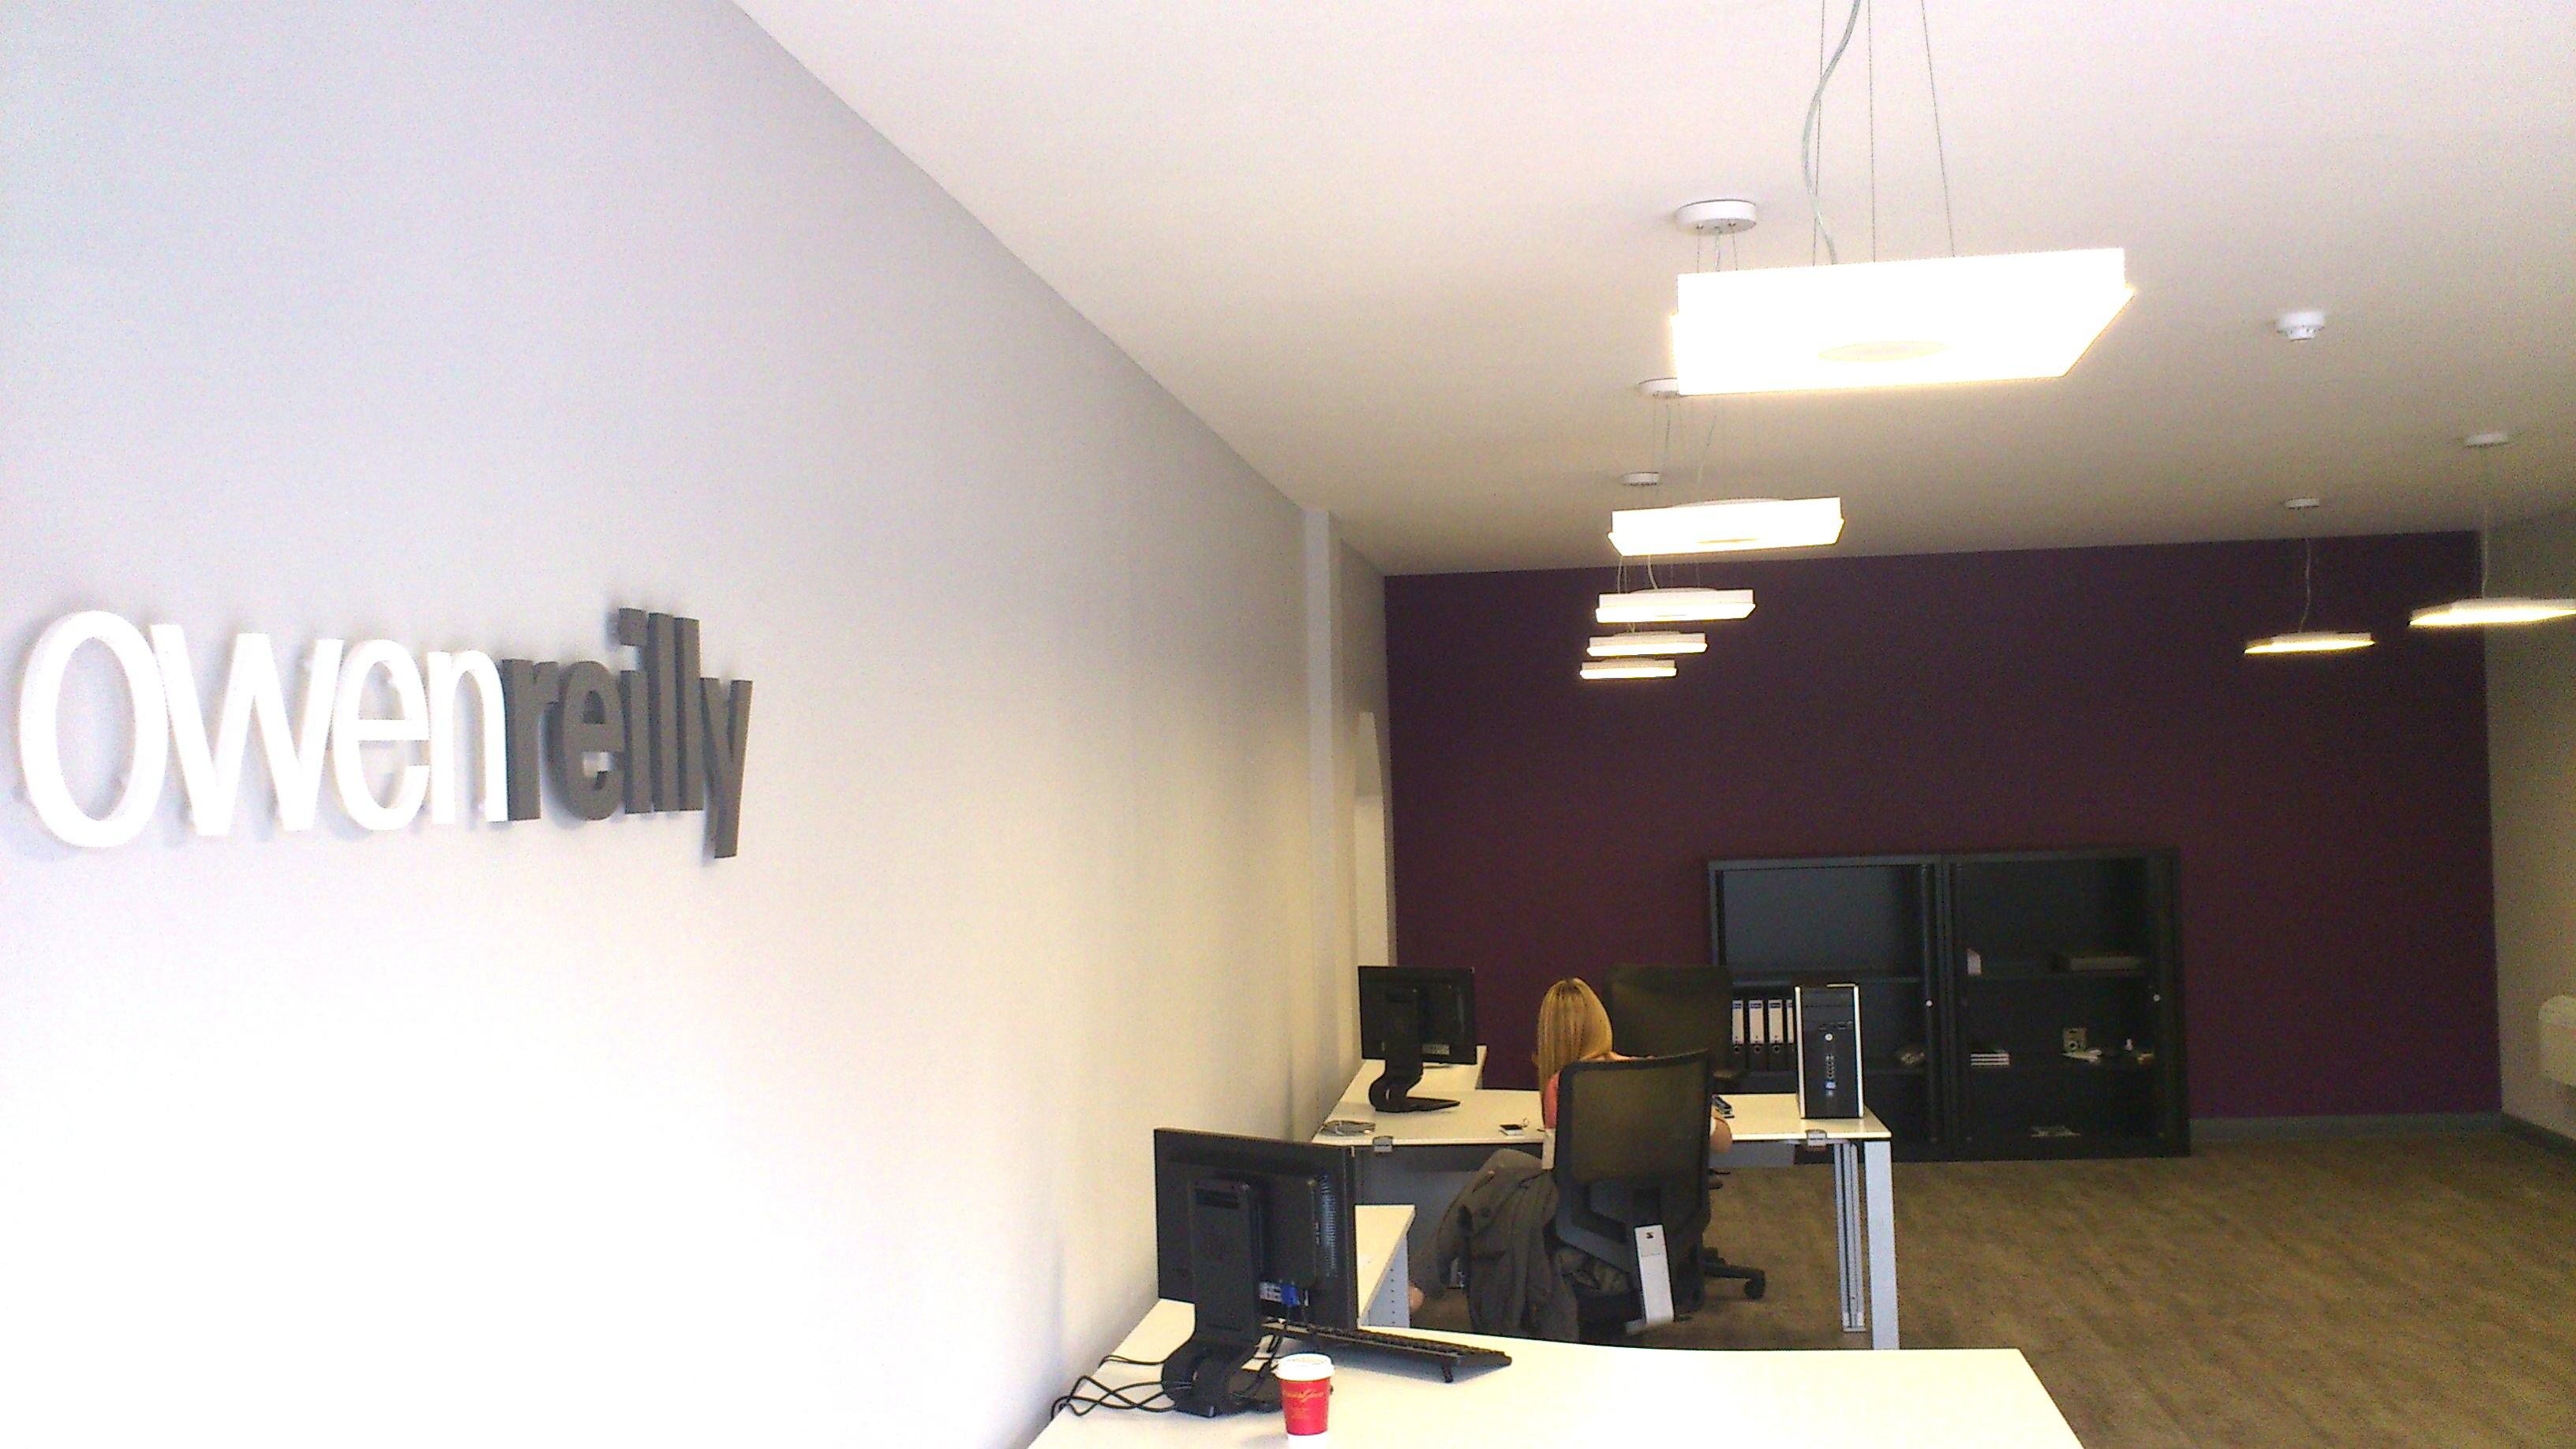 Owen Reilly Office Space